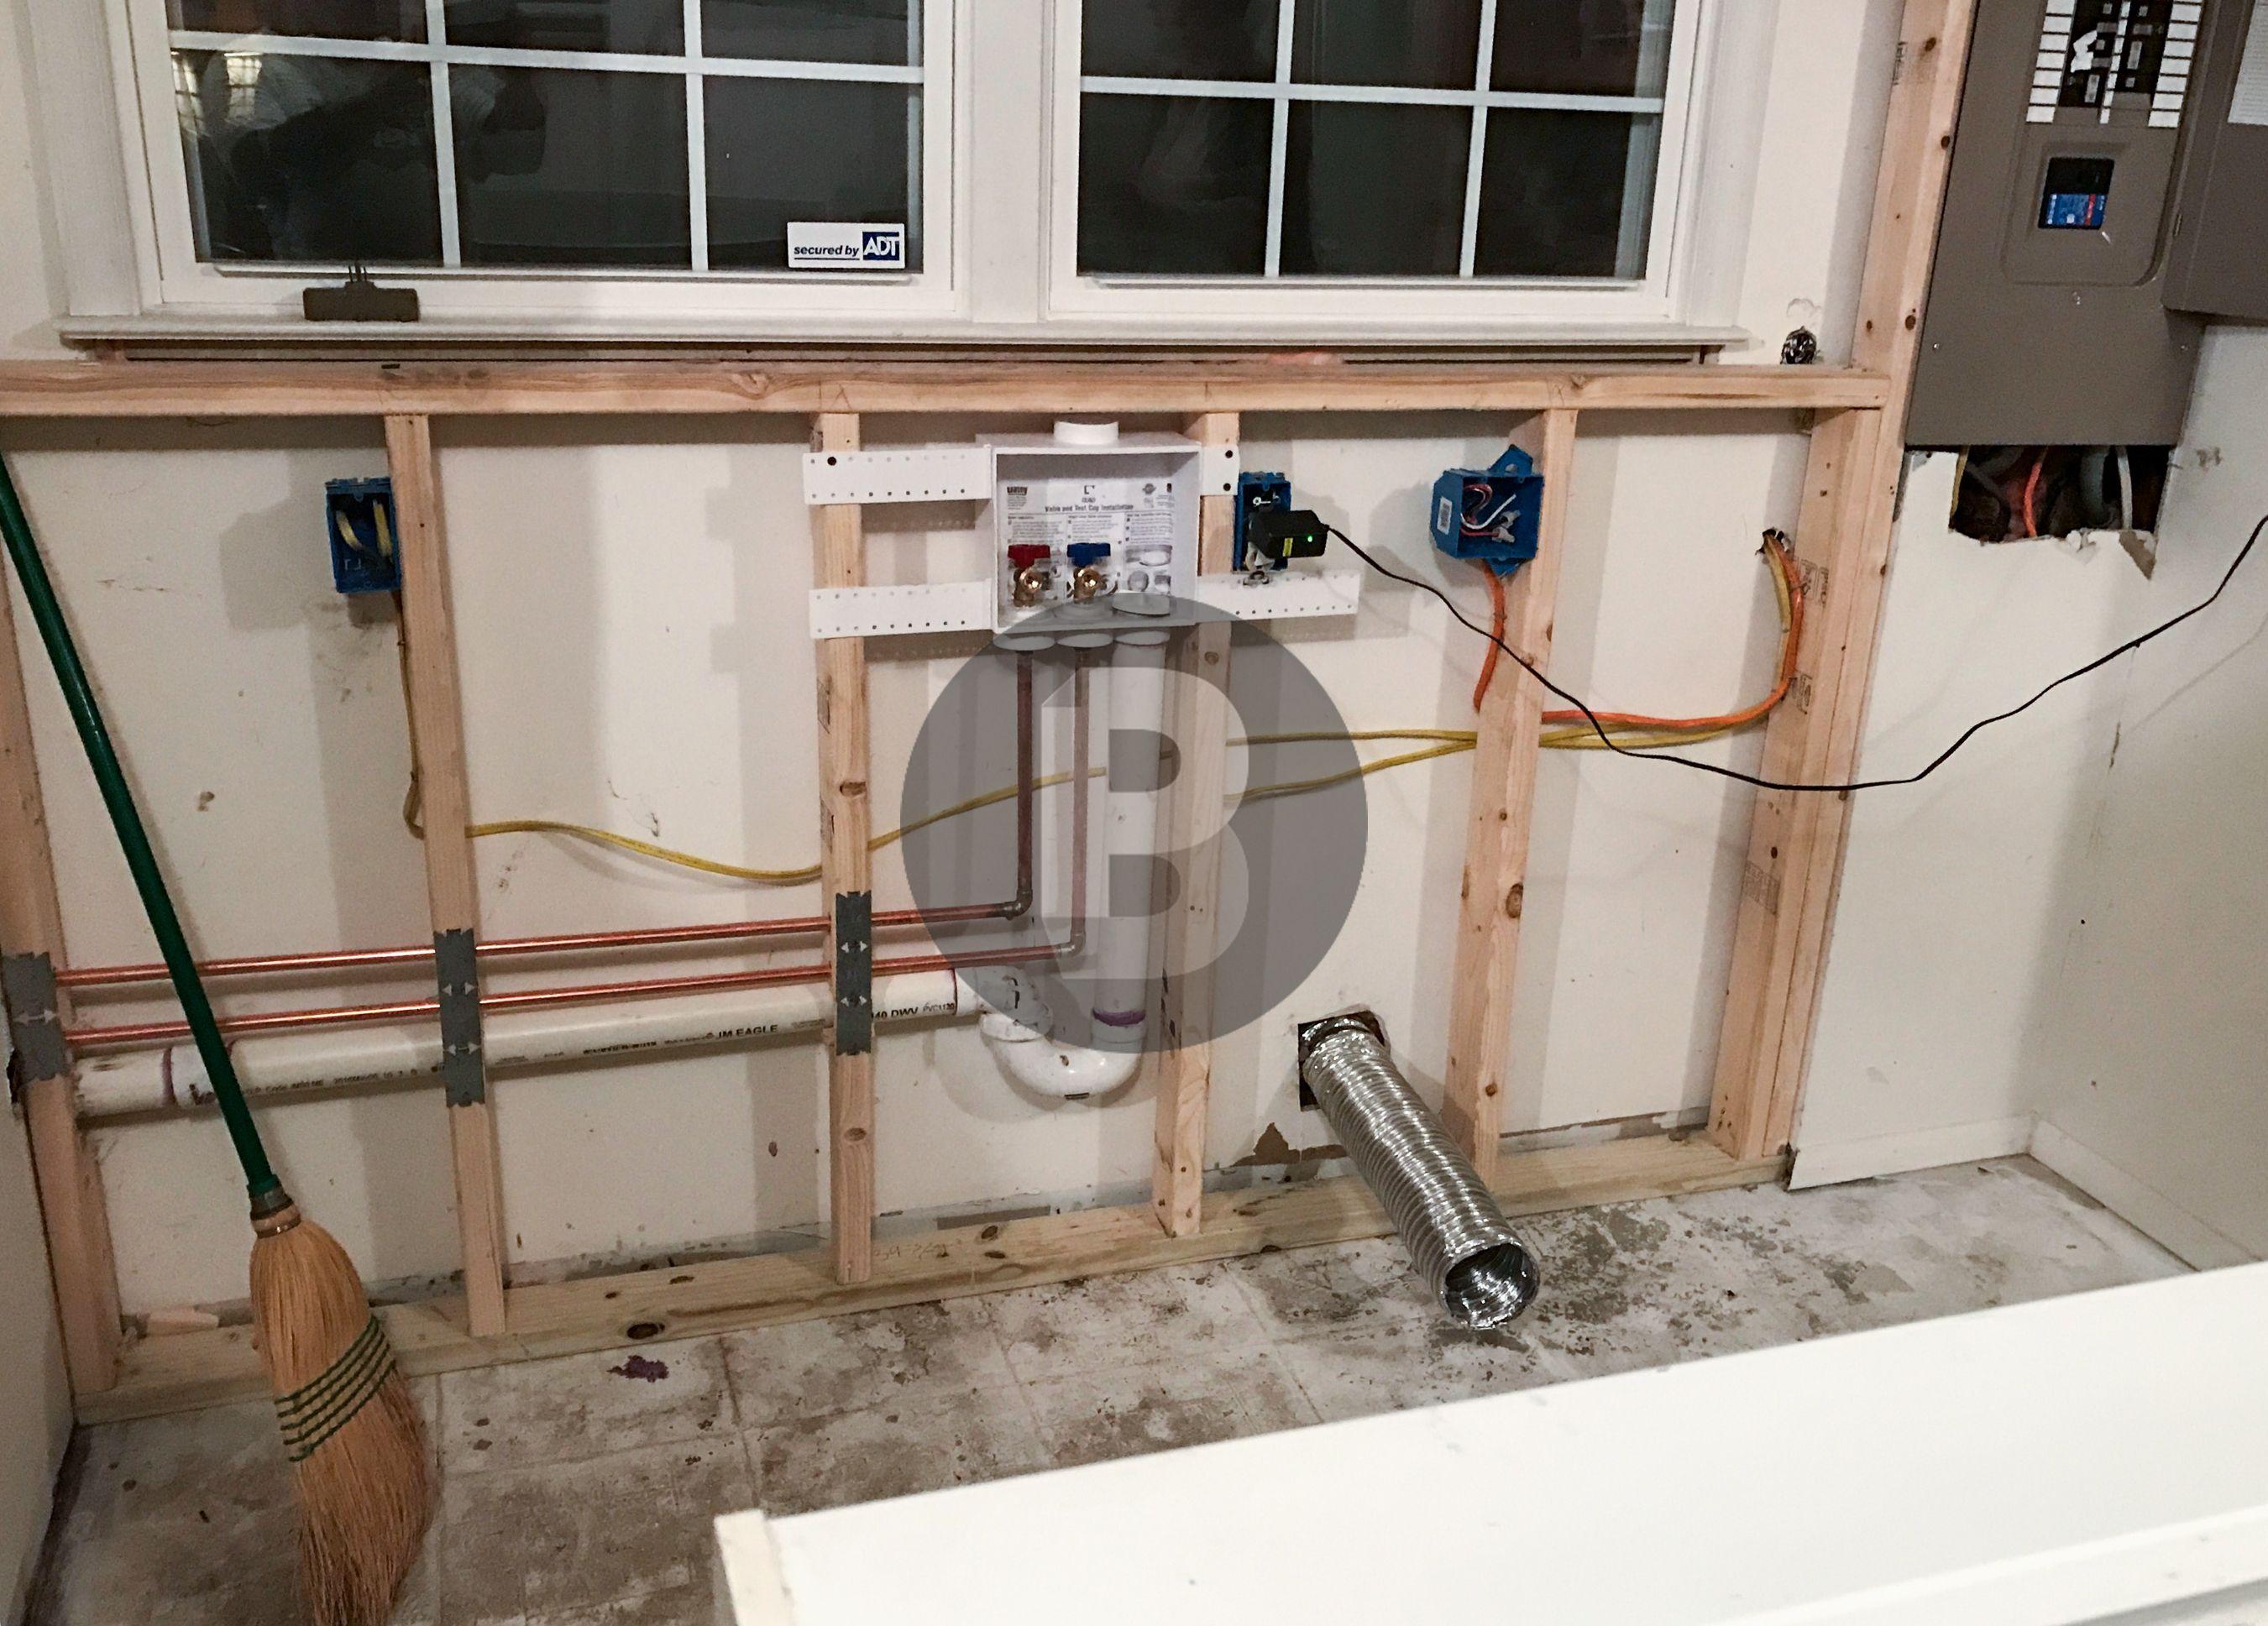 Atemberaubend Electrical Panel Wiring Code Galerie - Schaltplan ...